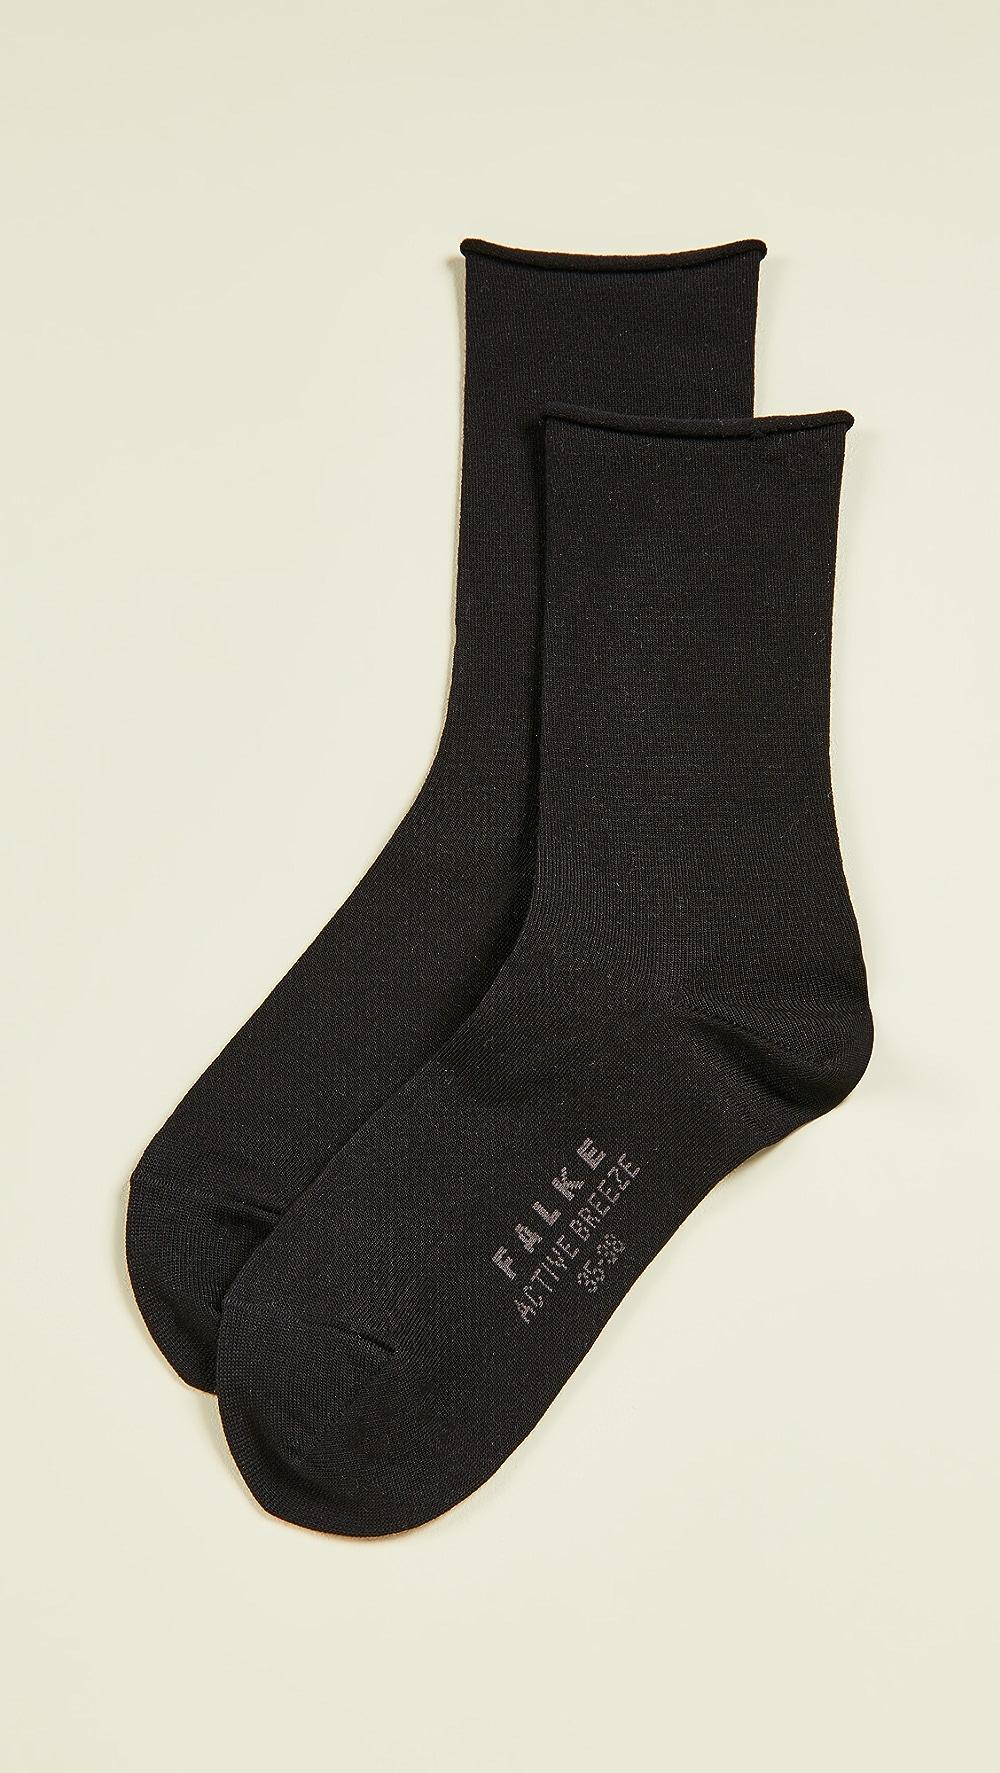 Honest Falke - Acitve Breeze Roll Top Socks Complete In Specifications